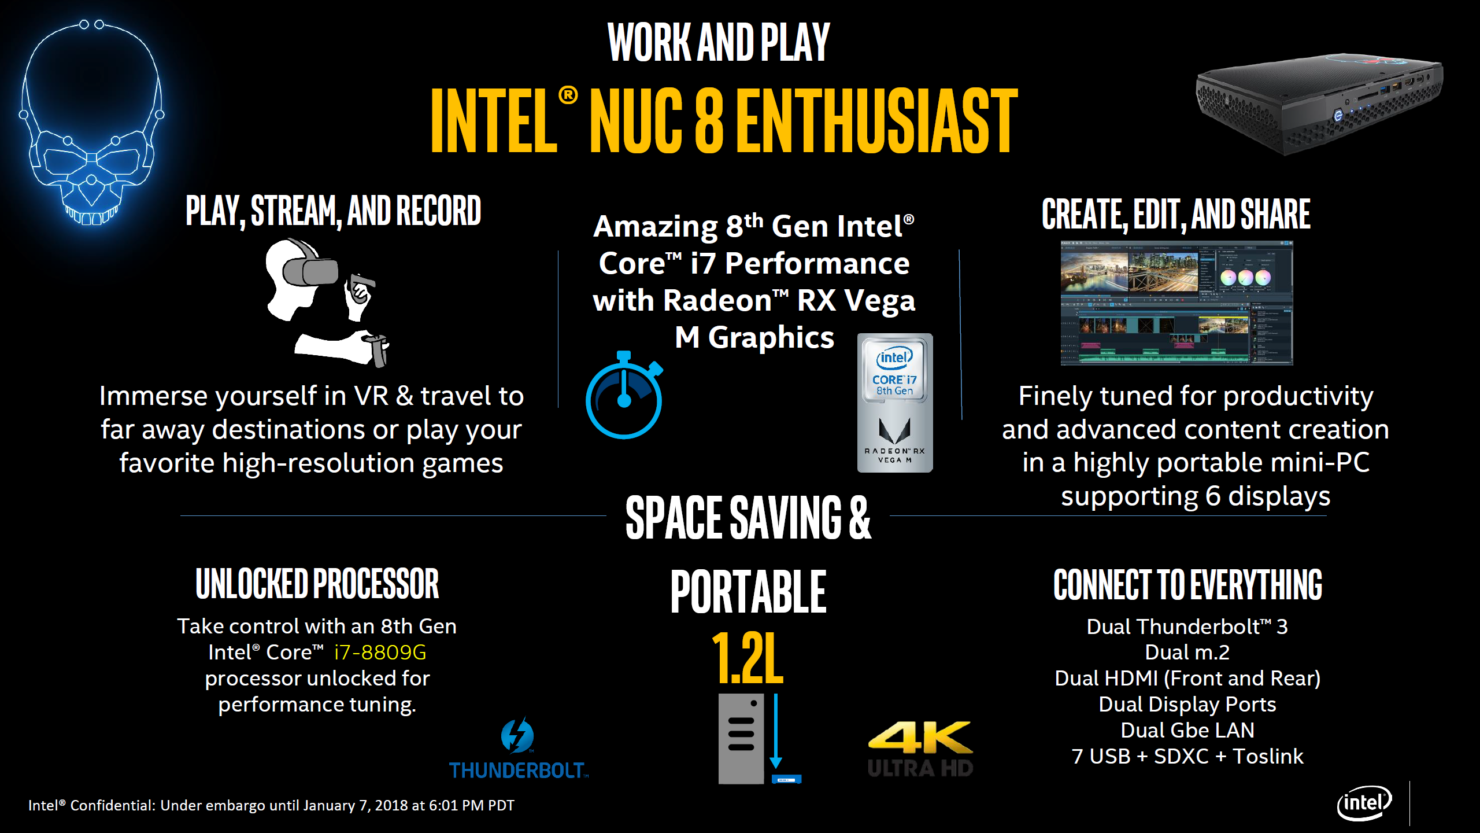 intel-8th-generation-core-processors-with-amd-radeon-rx-vega-m-graphics_23